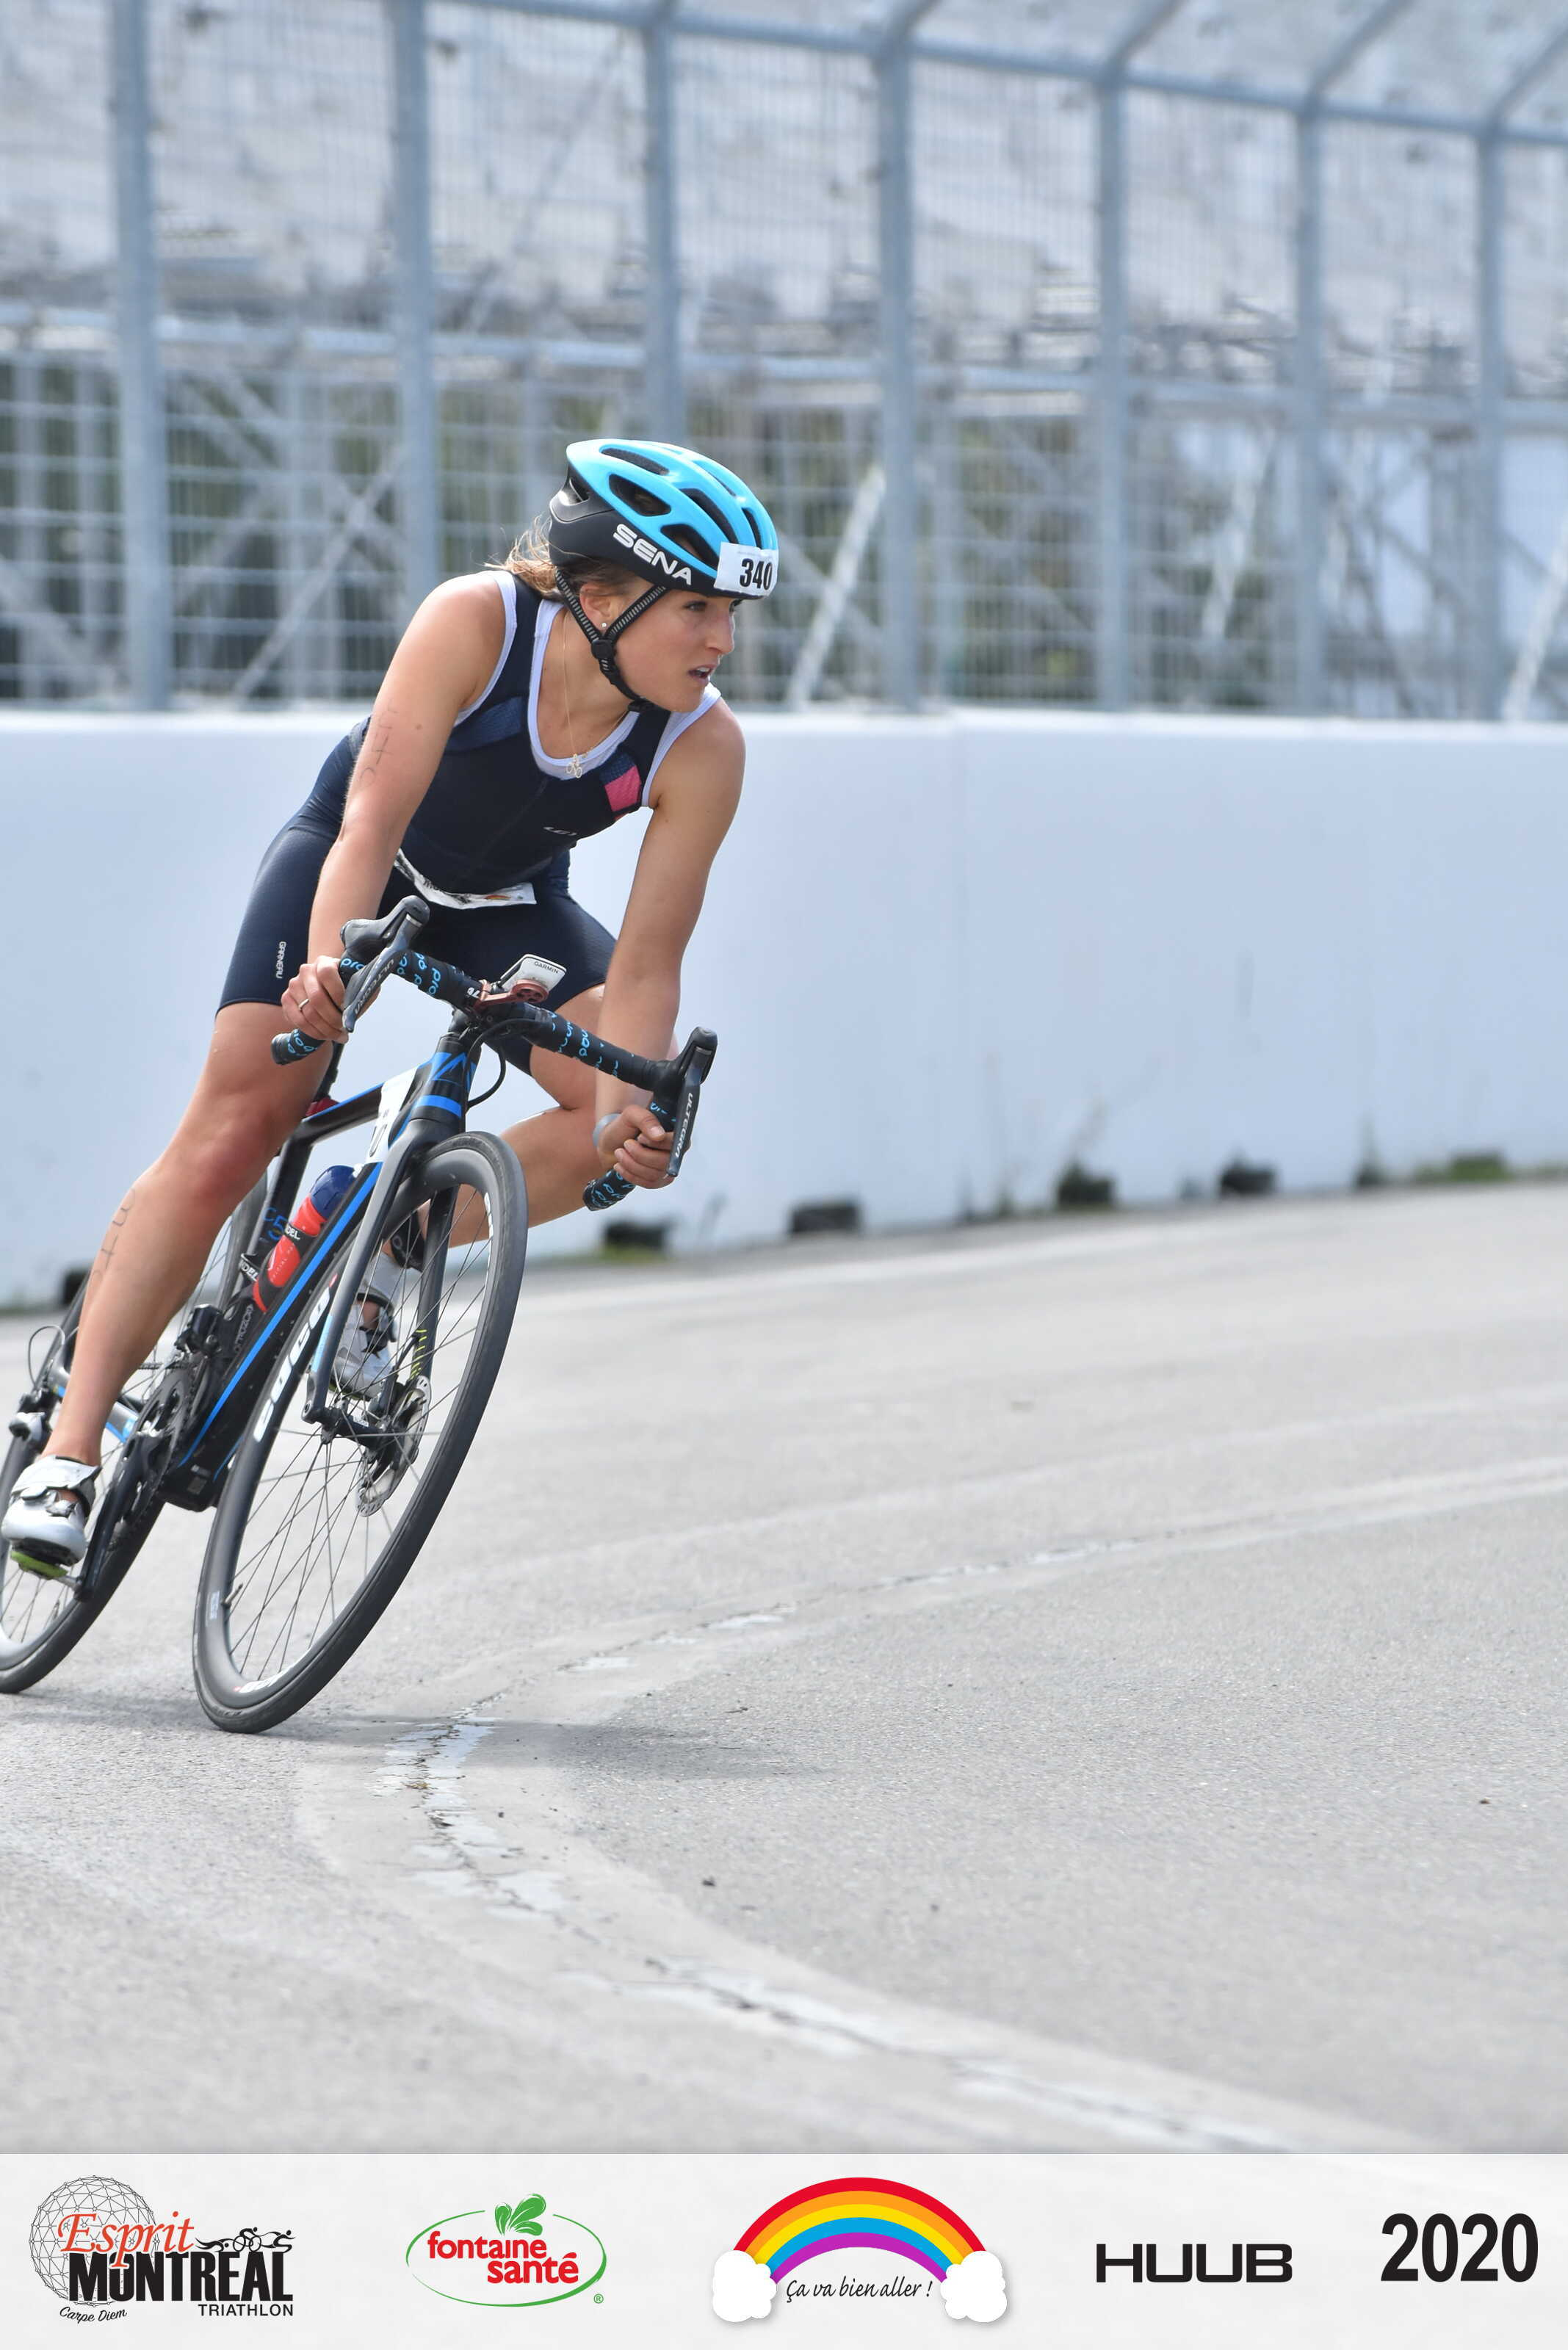 Lex Albrecht, Montreal Esprit Triathlon, Montreal triathlete, sena helmet, sena r1 helmet, Garneau tri suit,